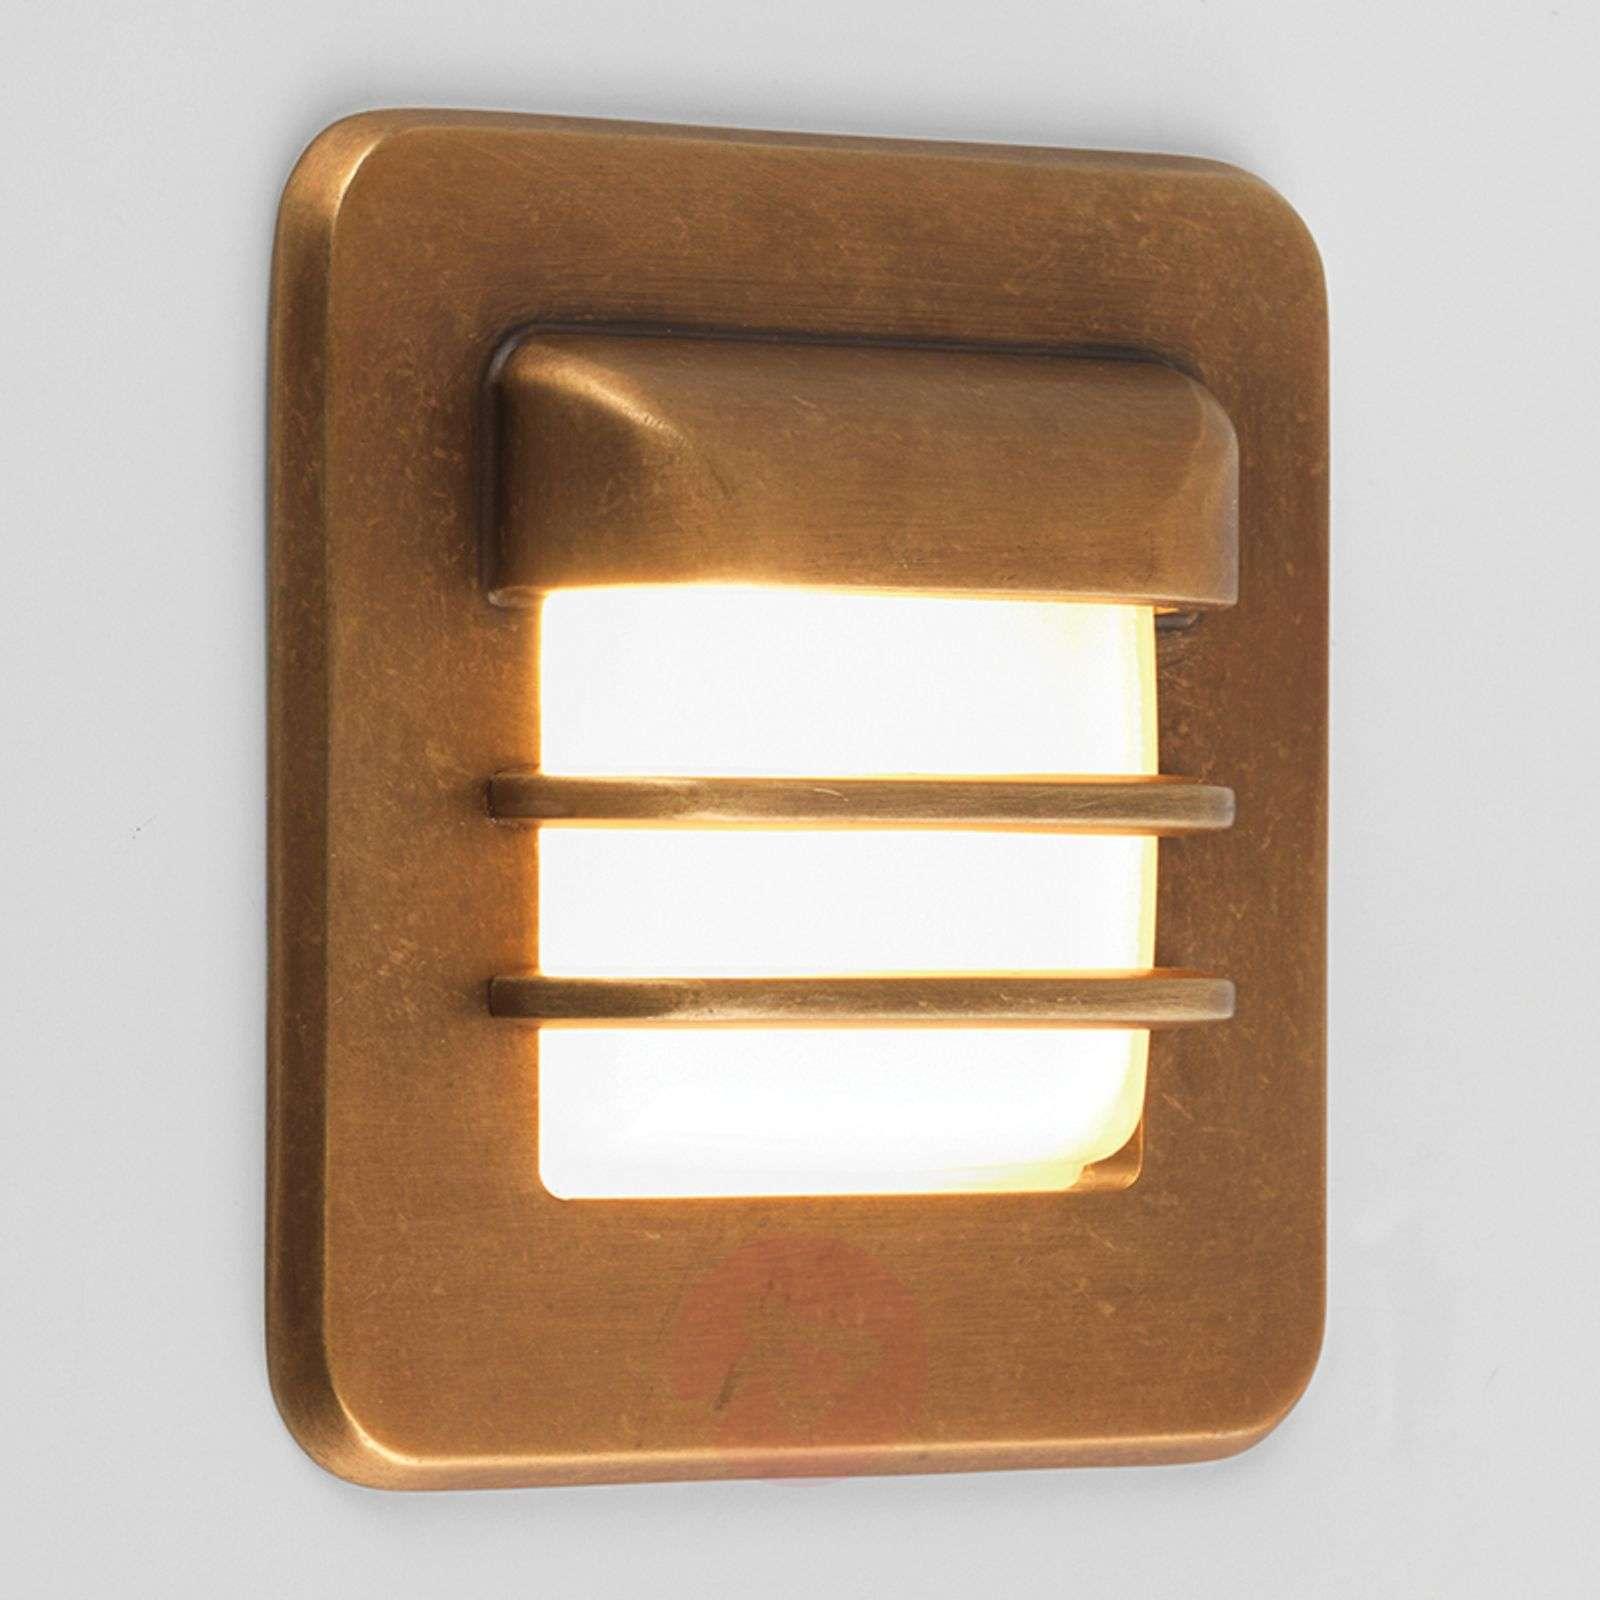 Astro Arran LED recessed light, angular-1020565-01